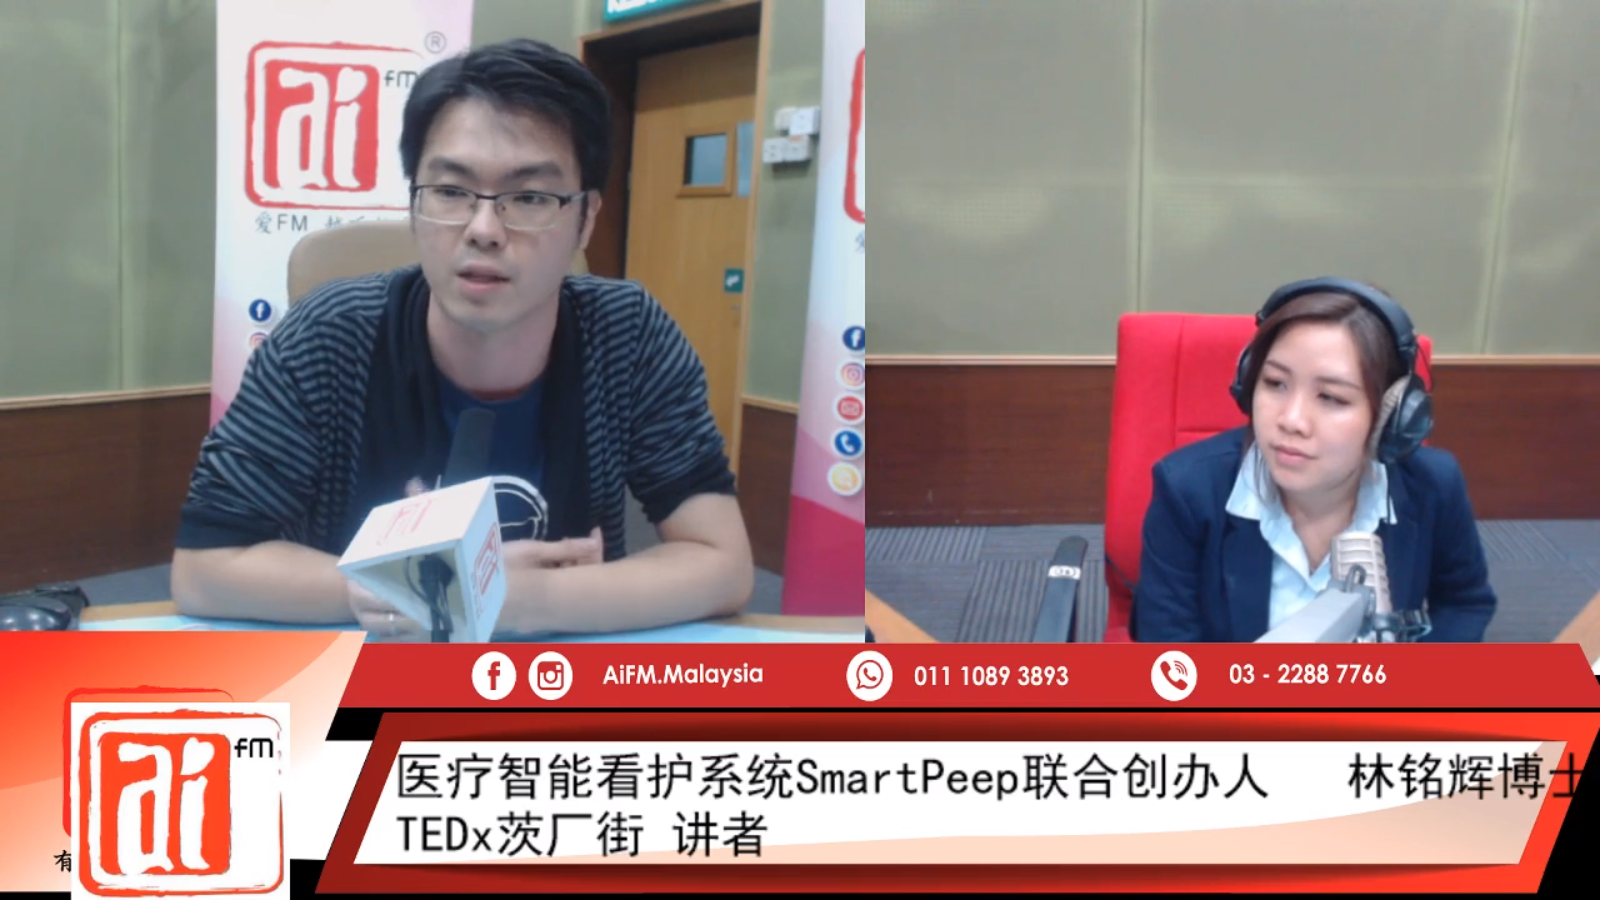 Prevent Elderly from Falling? Artificial Intelligence can do it! | Ai FM  爱 FM: 防止老人跌倒?人工智能做得到!